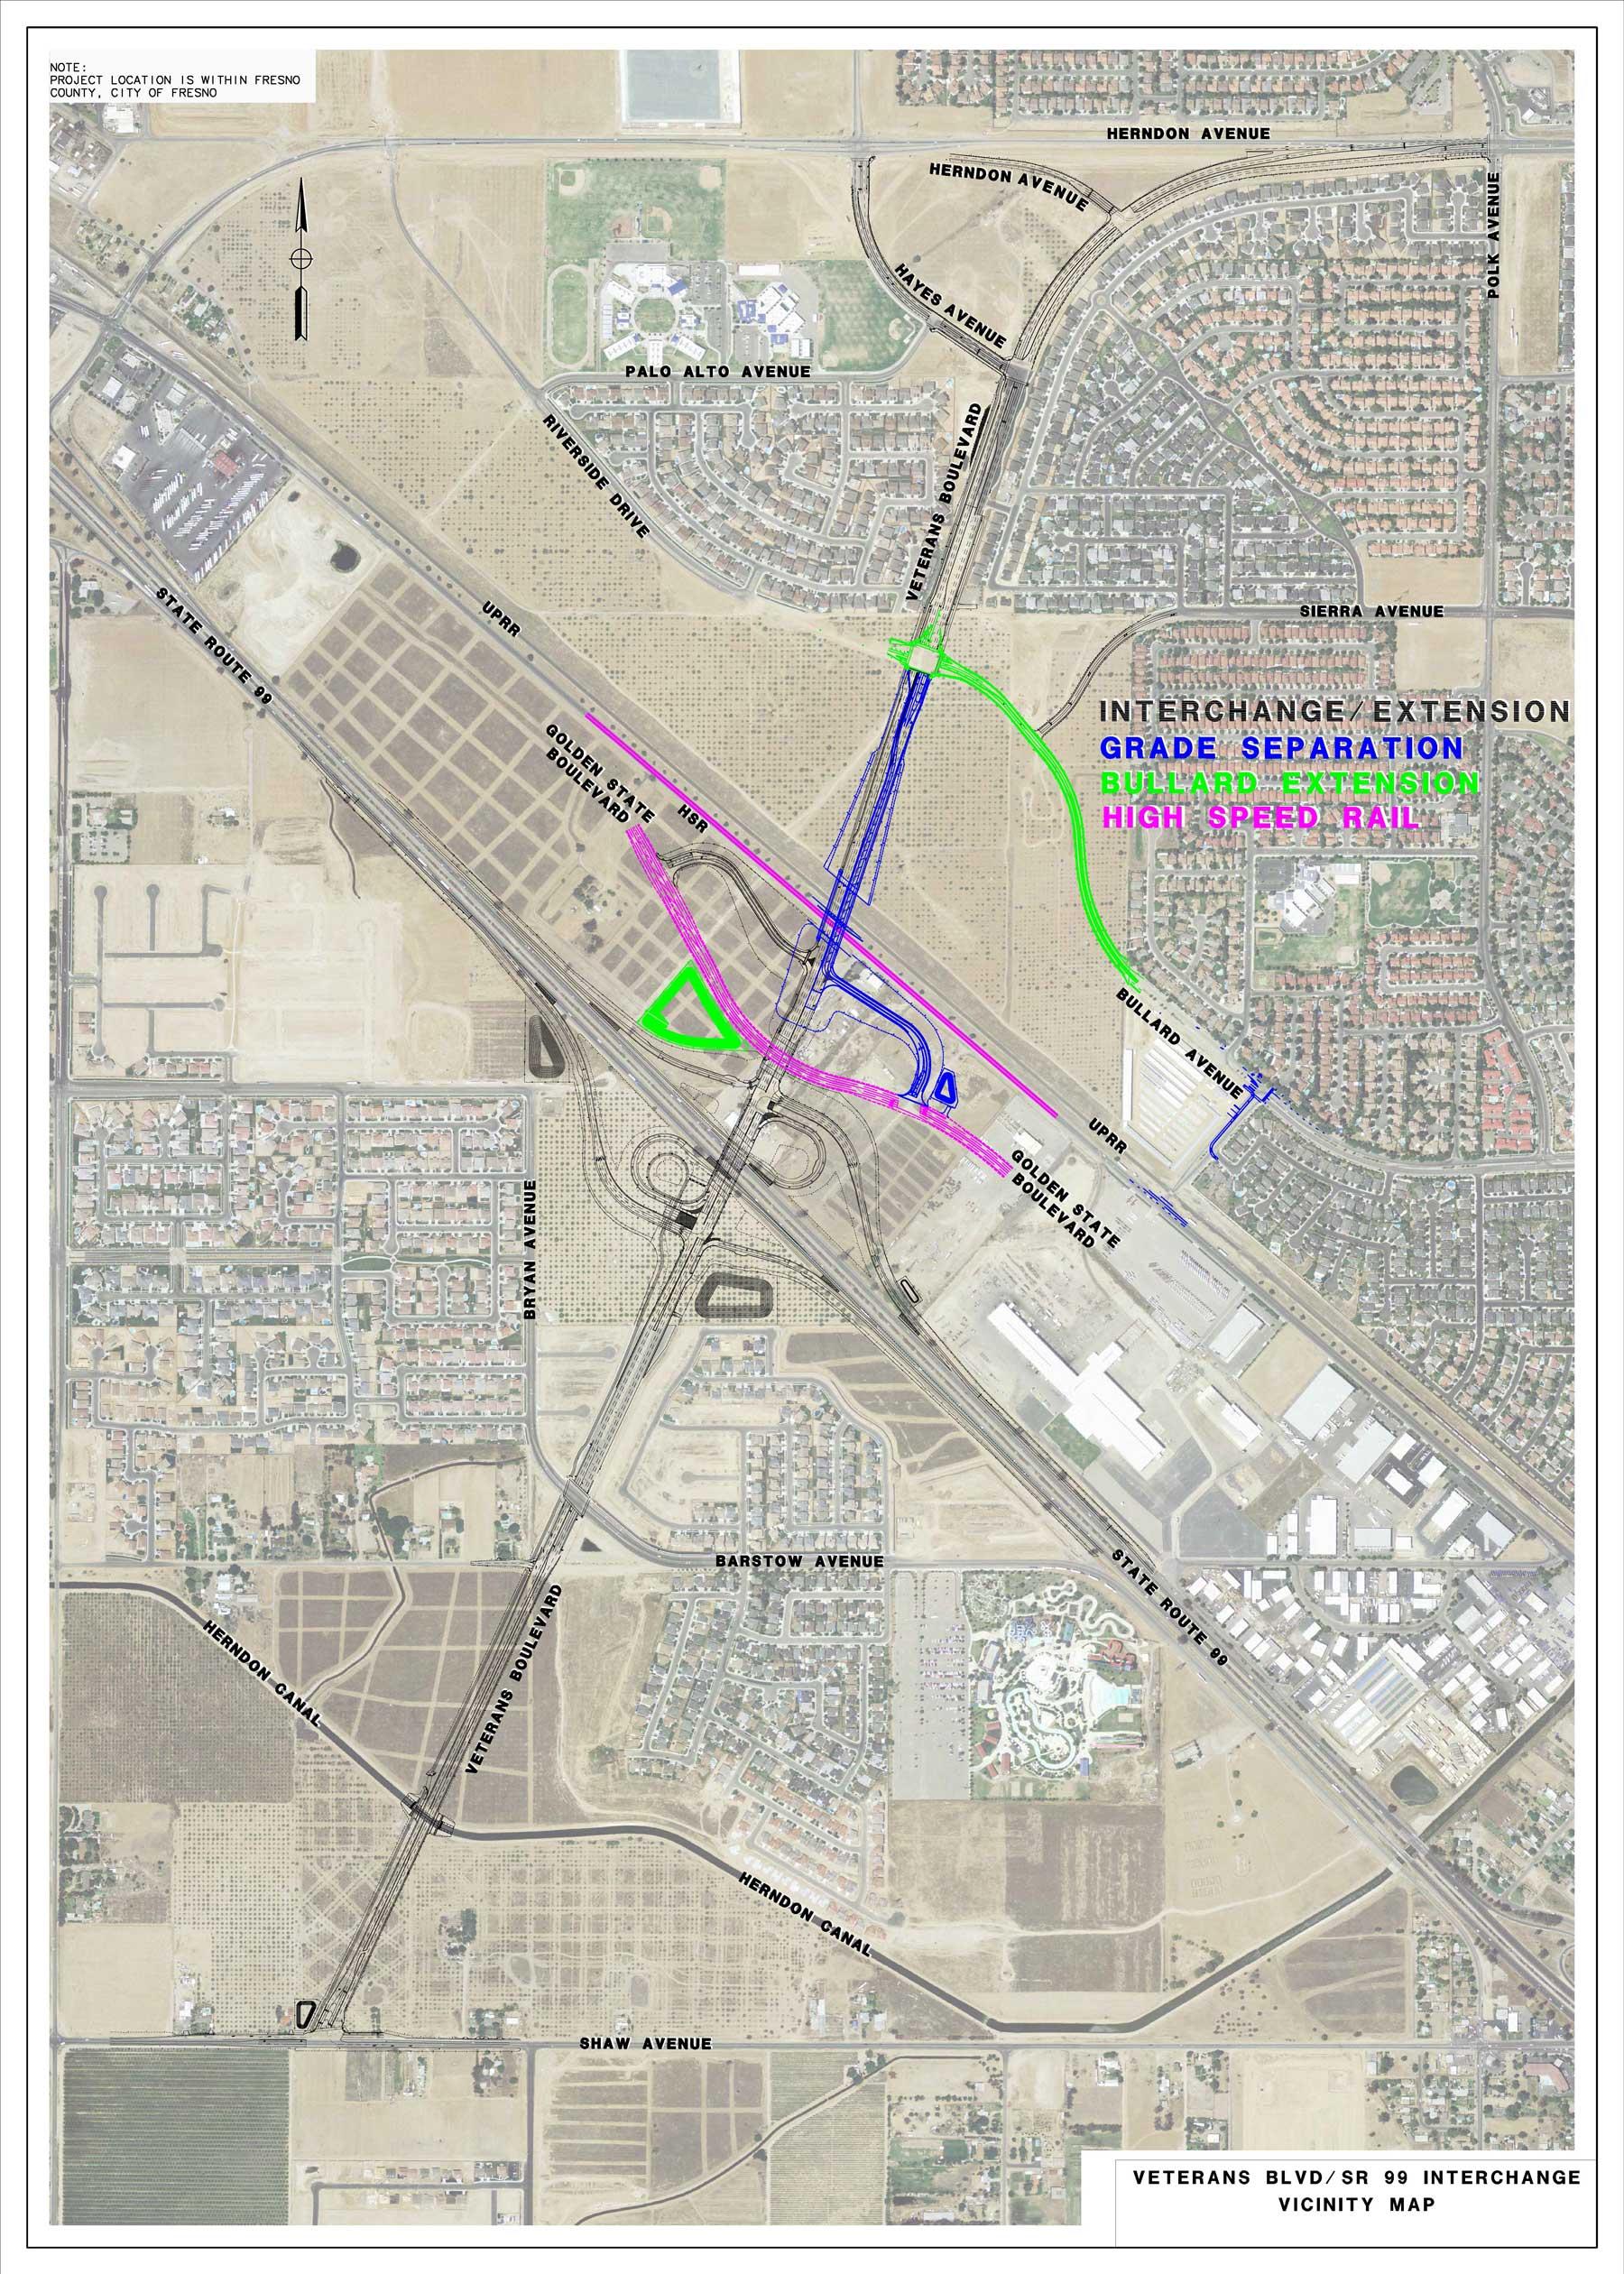 Veterans Boulevard Map Overall 2